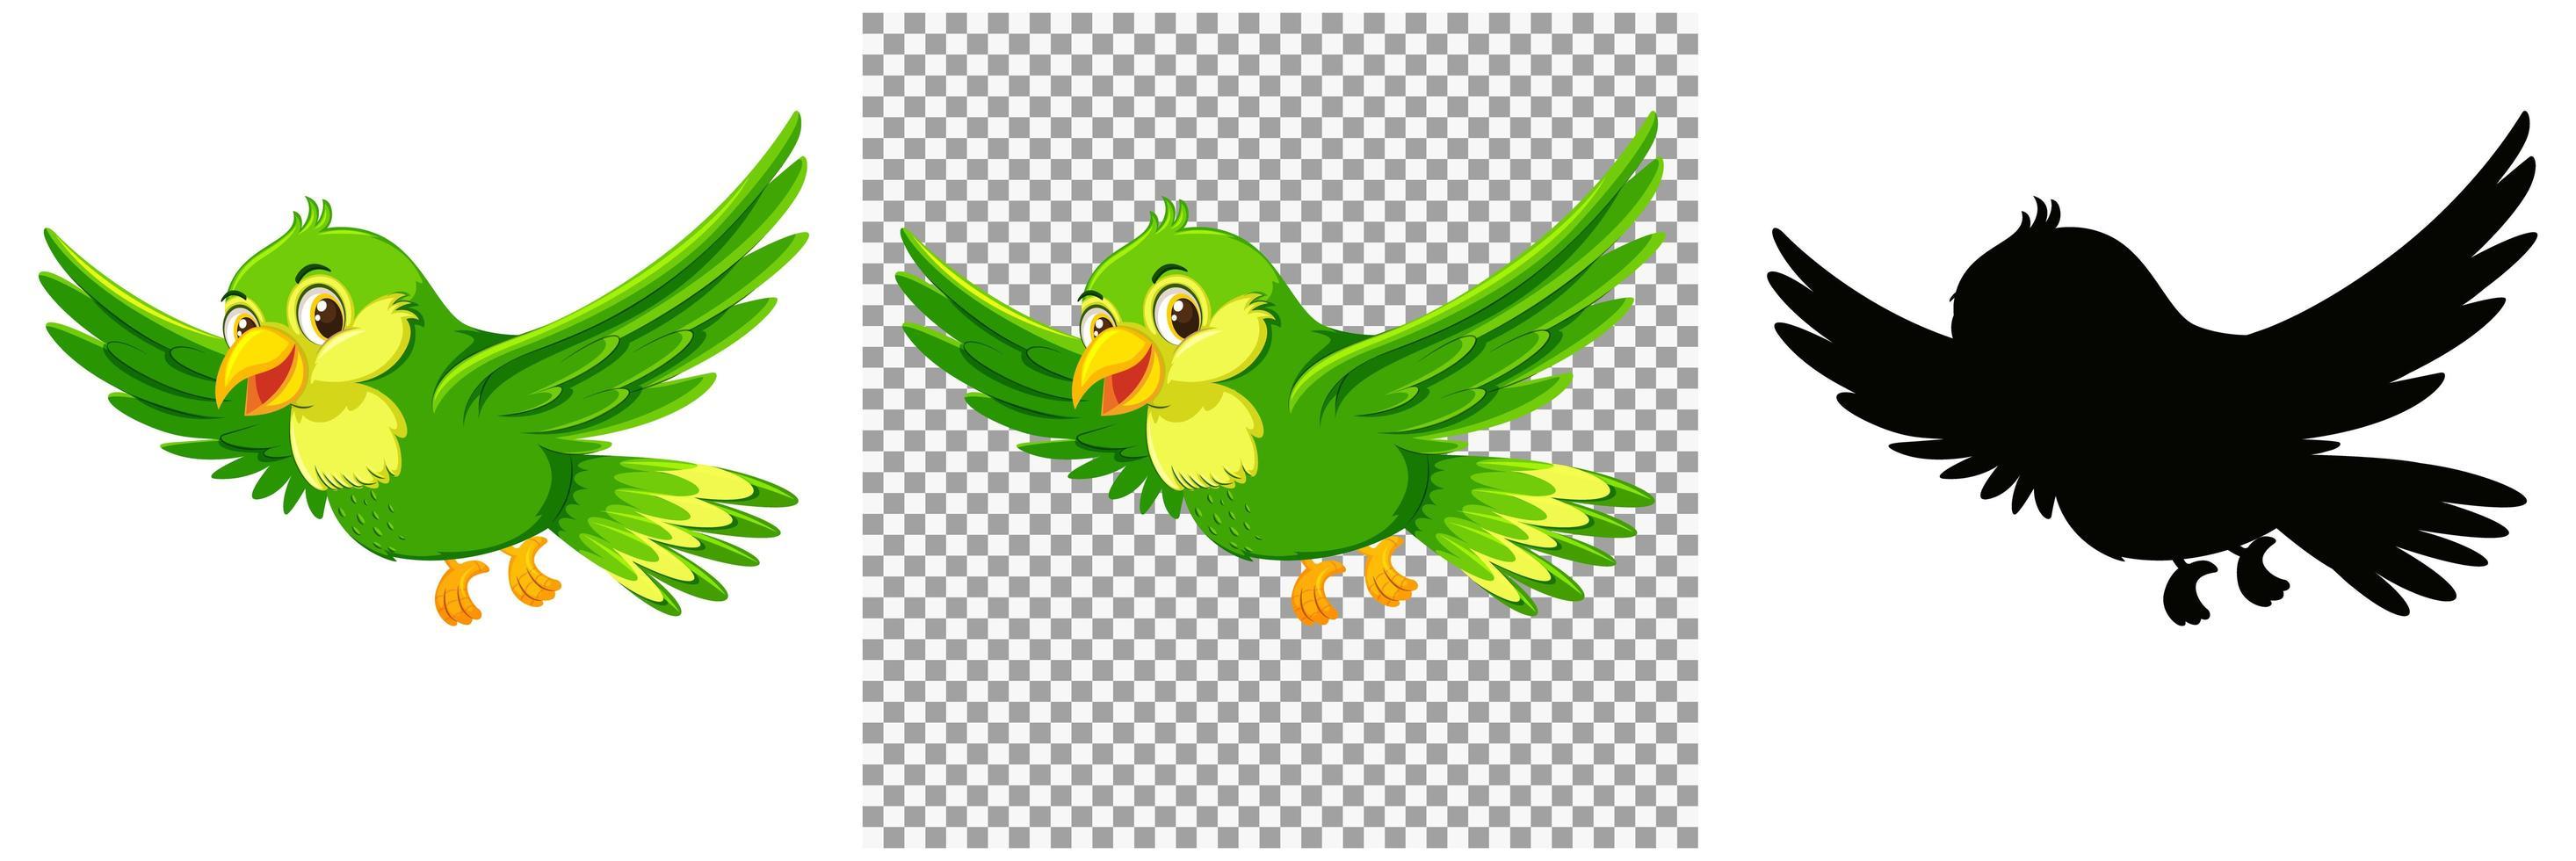 groene vogel stripfiguur vector